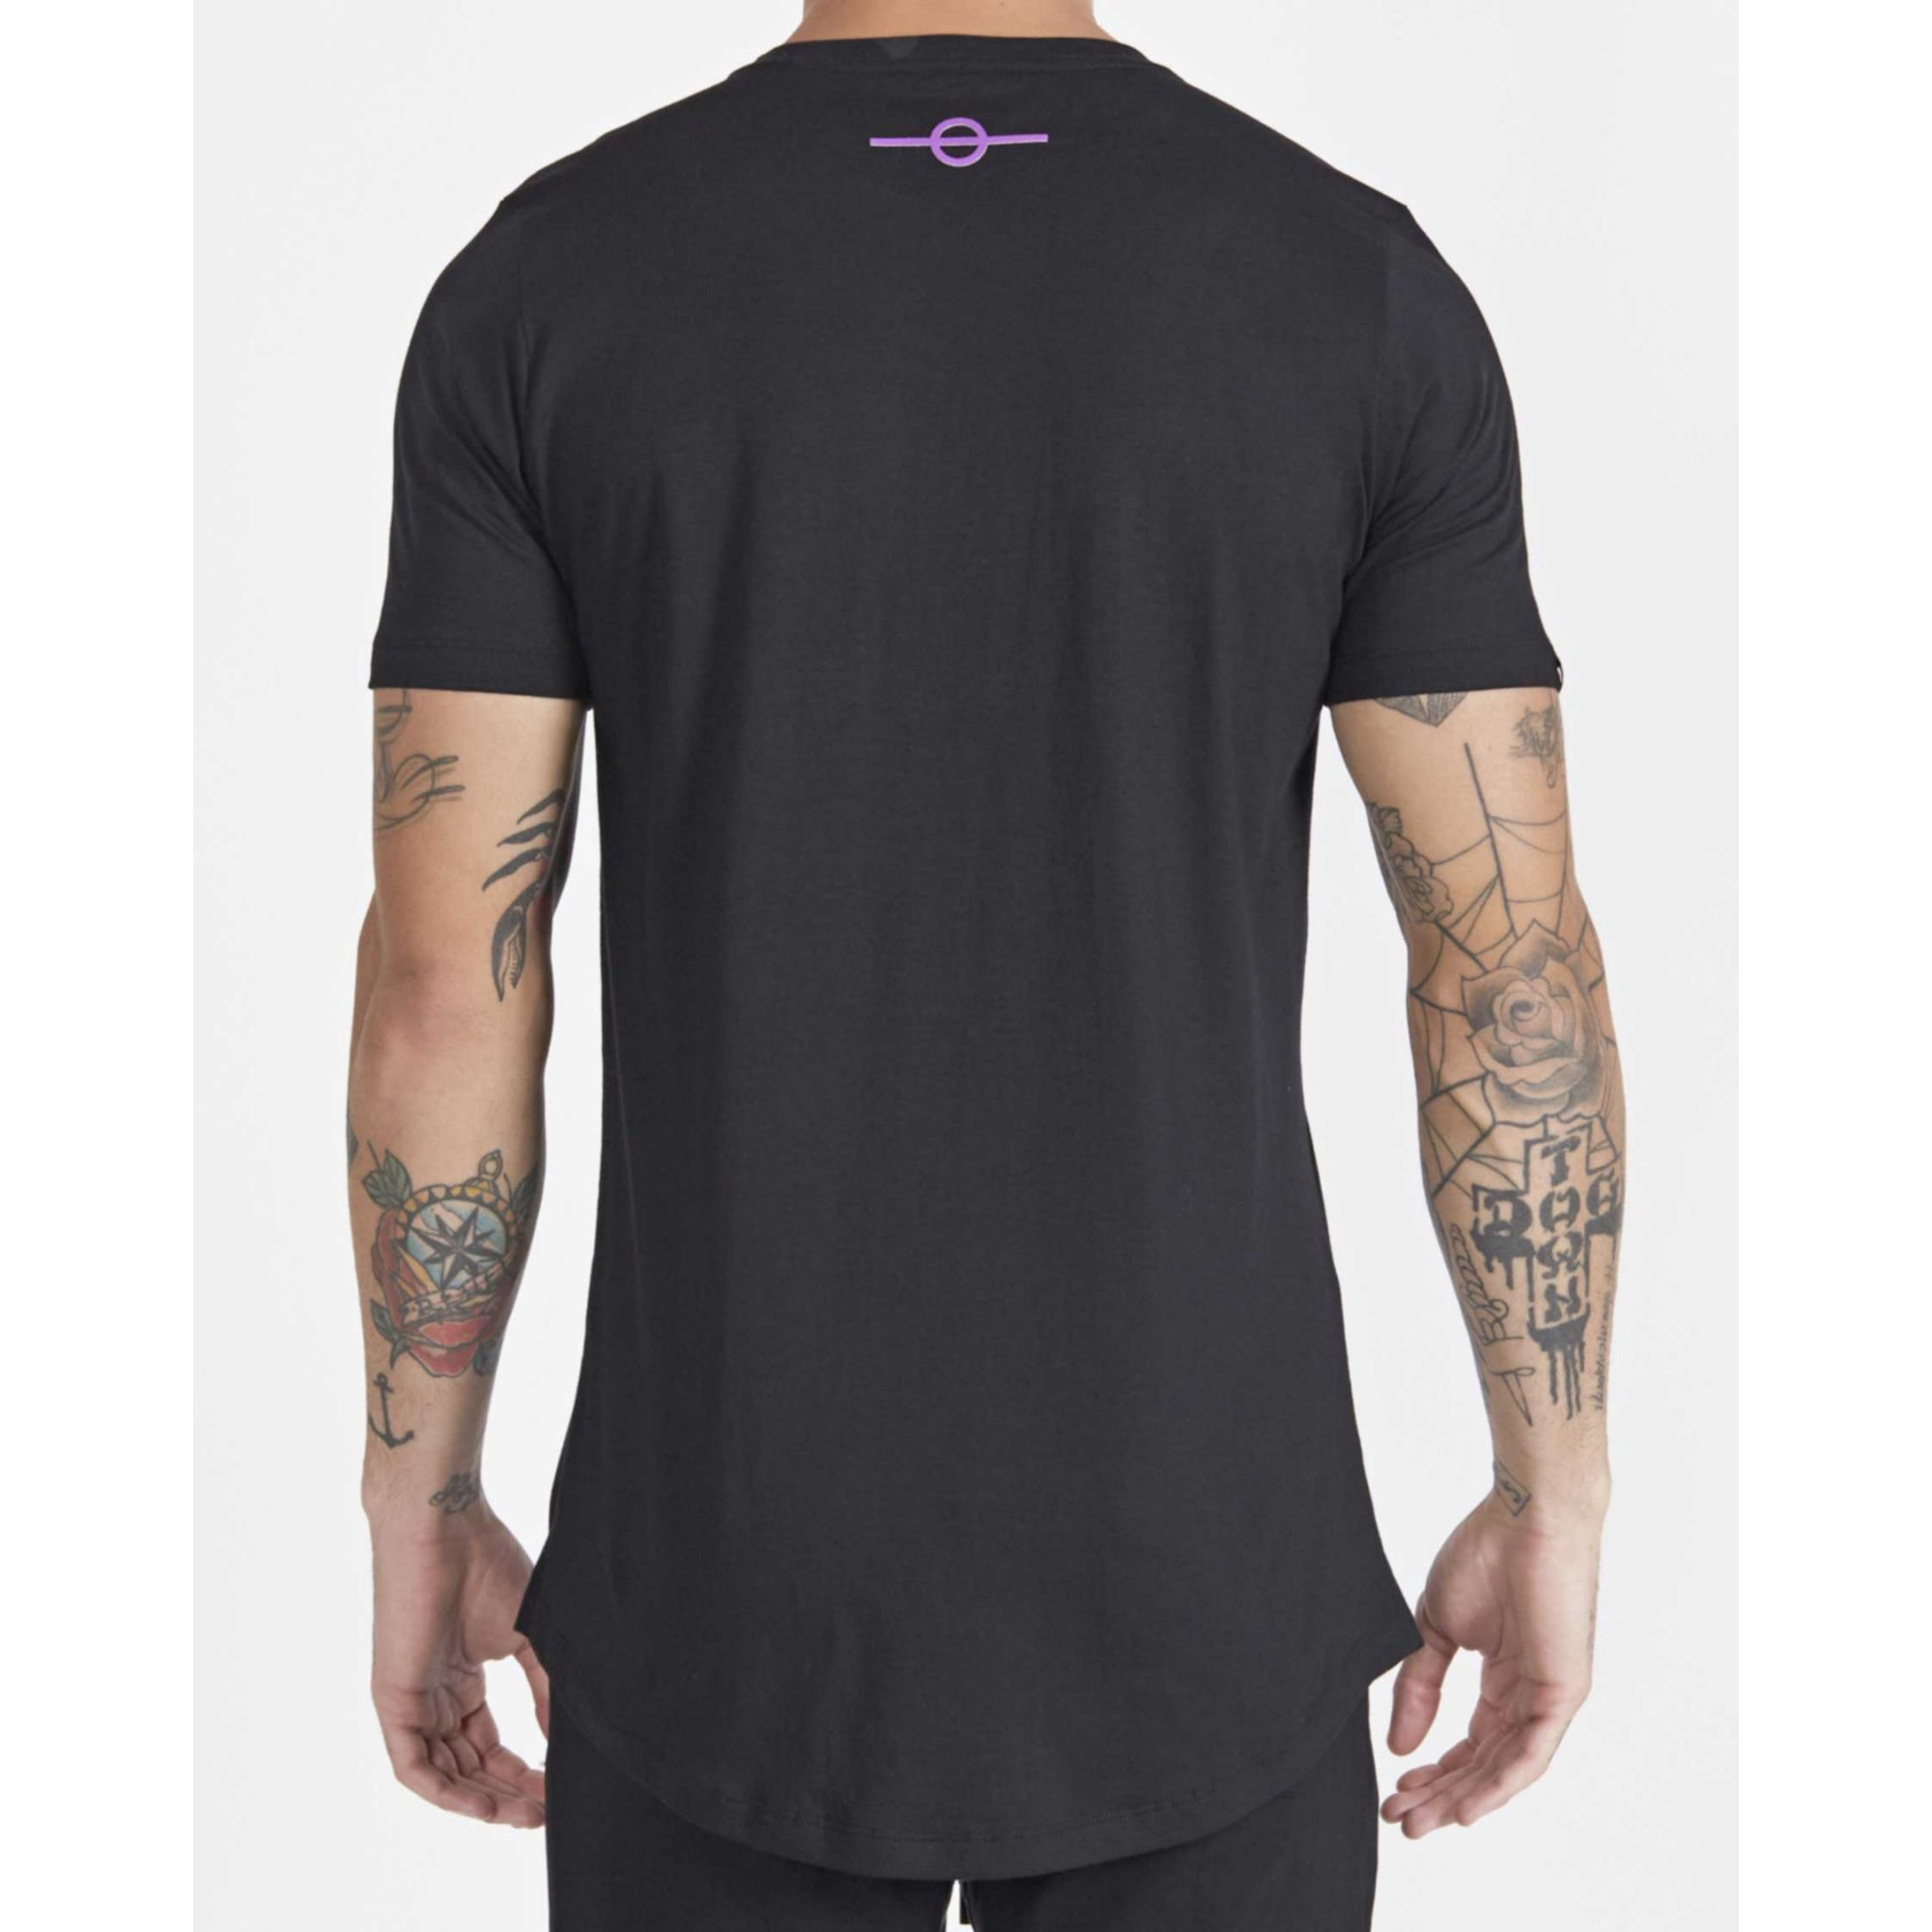 Camiseta Buh Precious Stripes Black